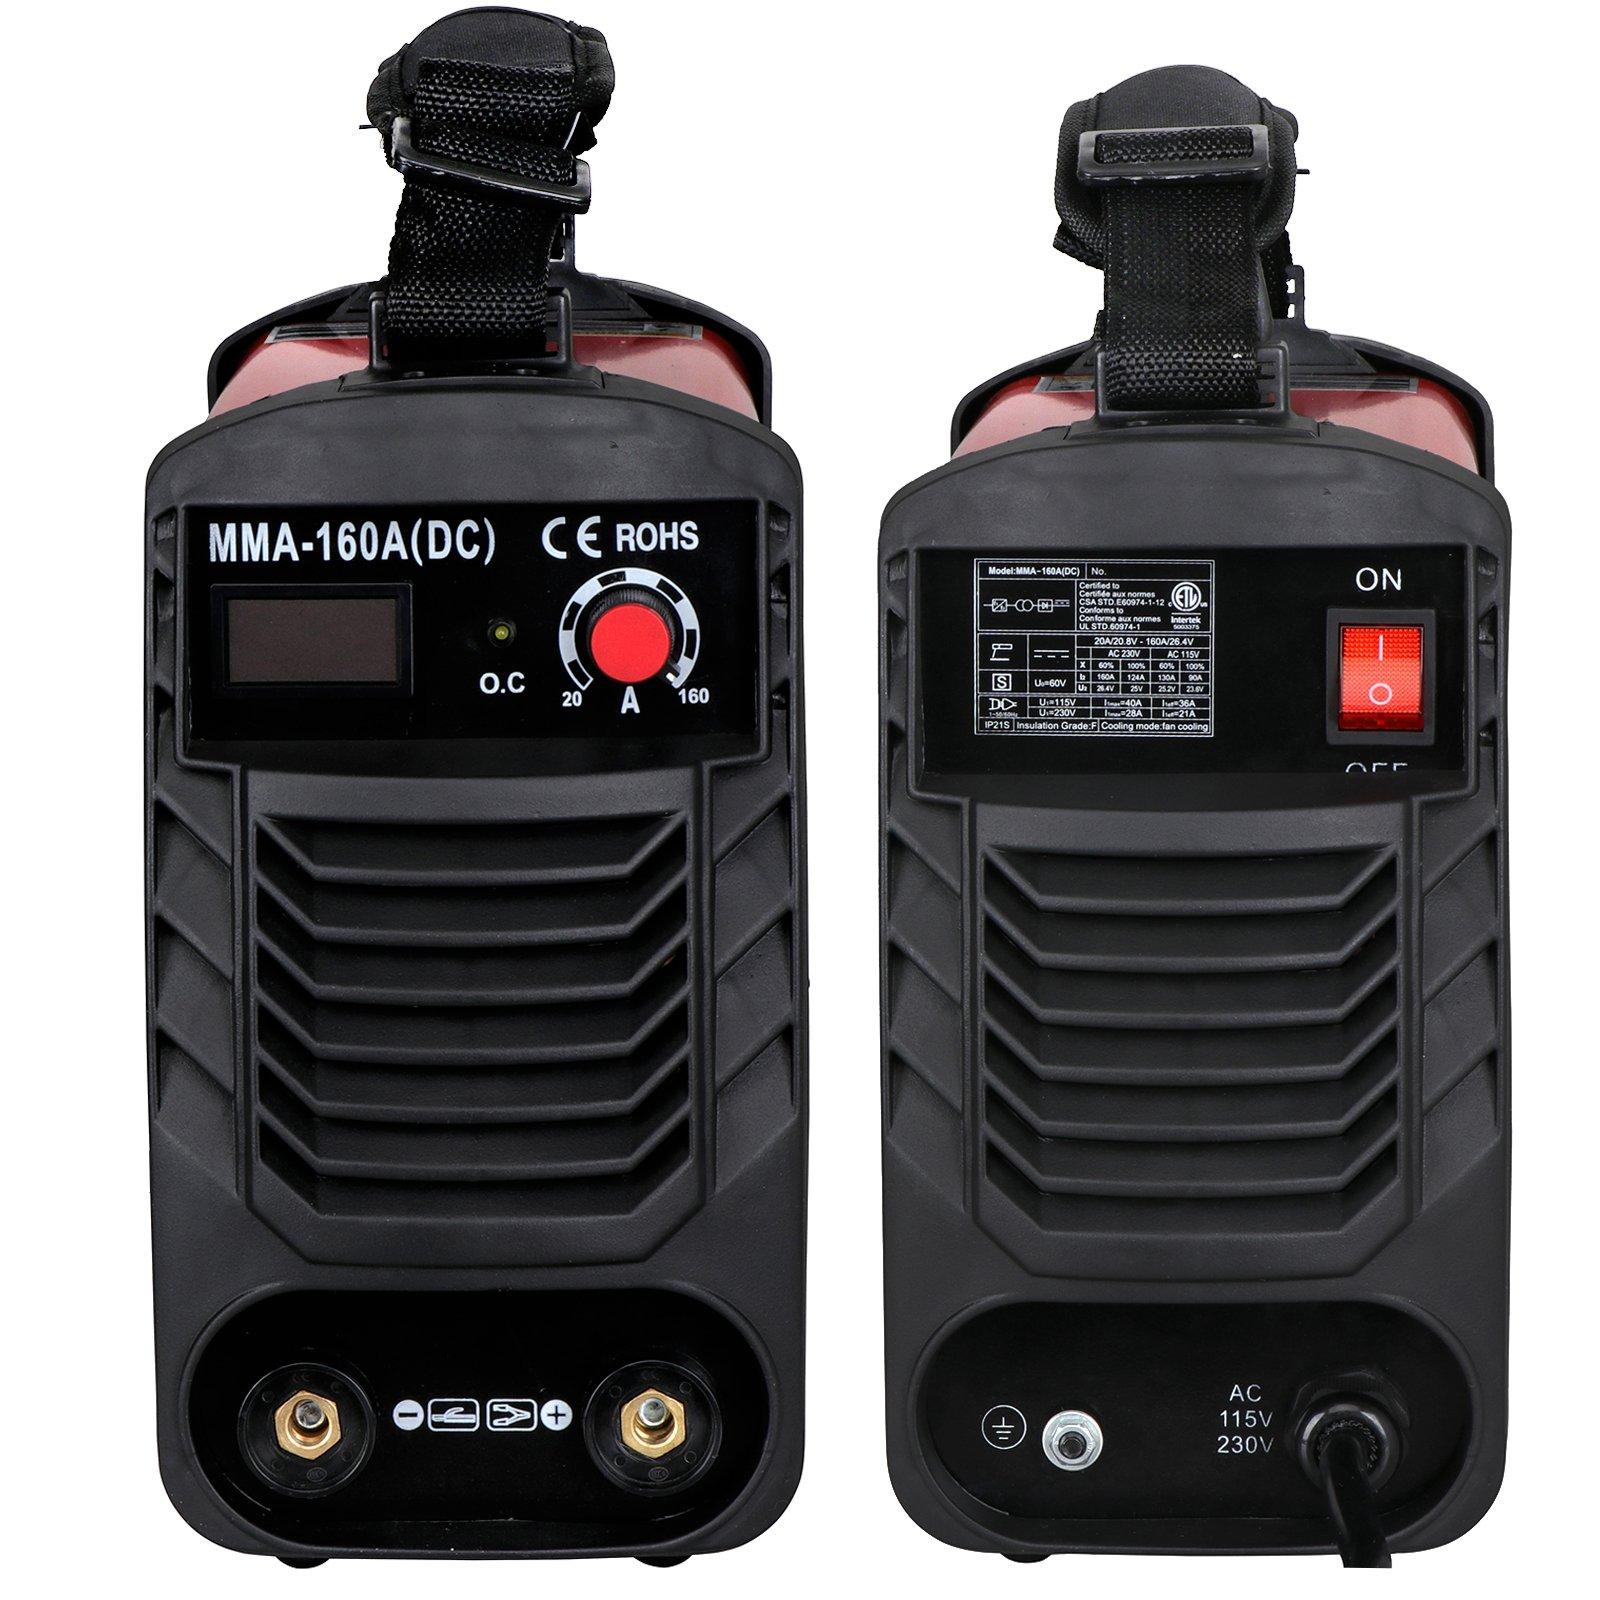 ZENY Arc Welding Machine DC Inverter Handheld Welder MMA 20-160A IGBT 110V/230V Dual Voltage IGBT Stick by ZENY (Image #4)